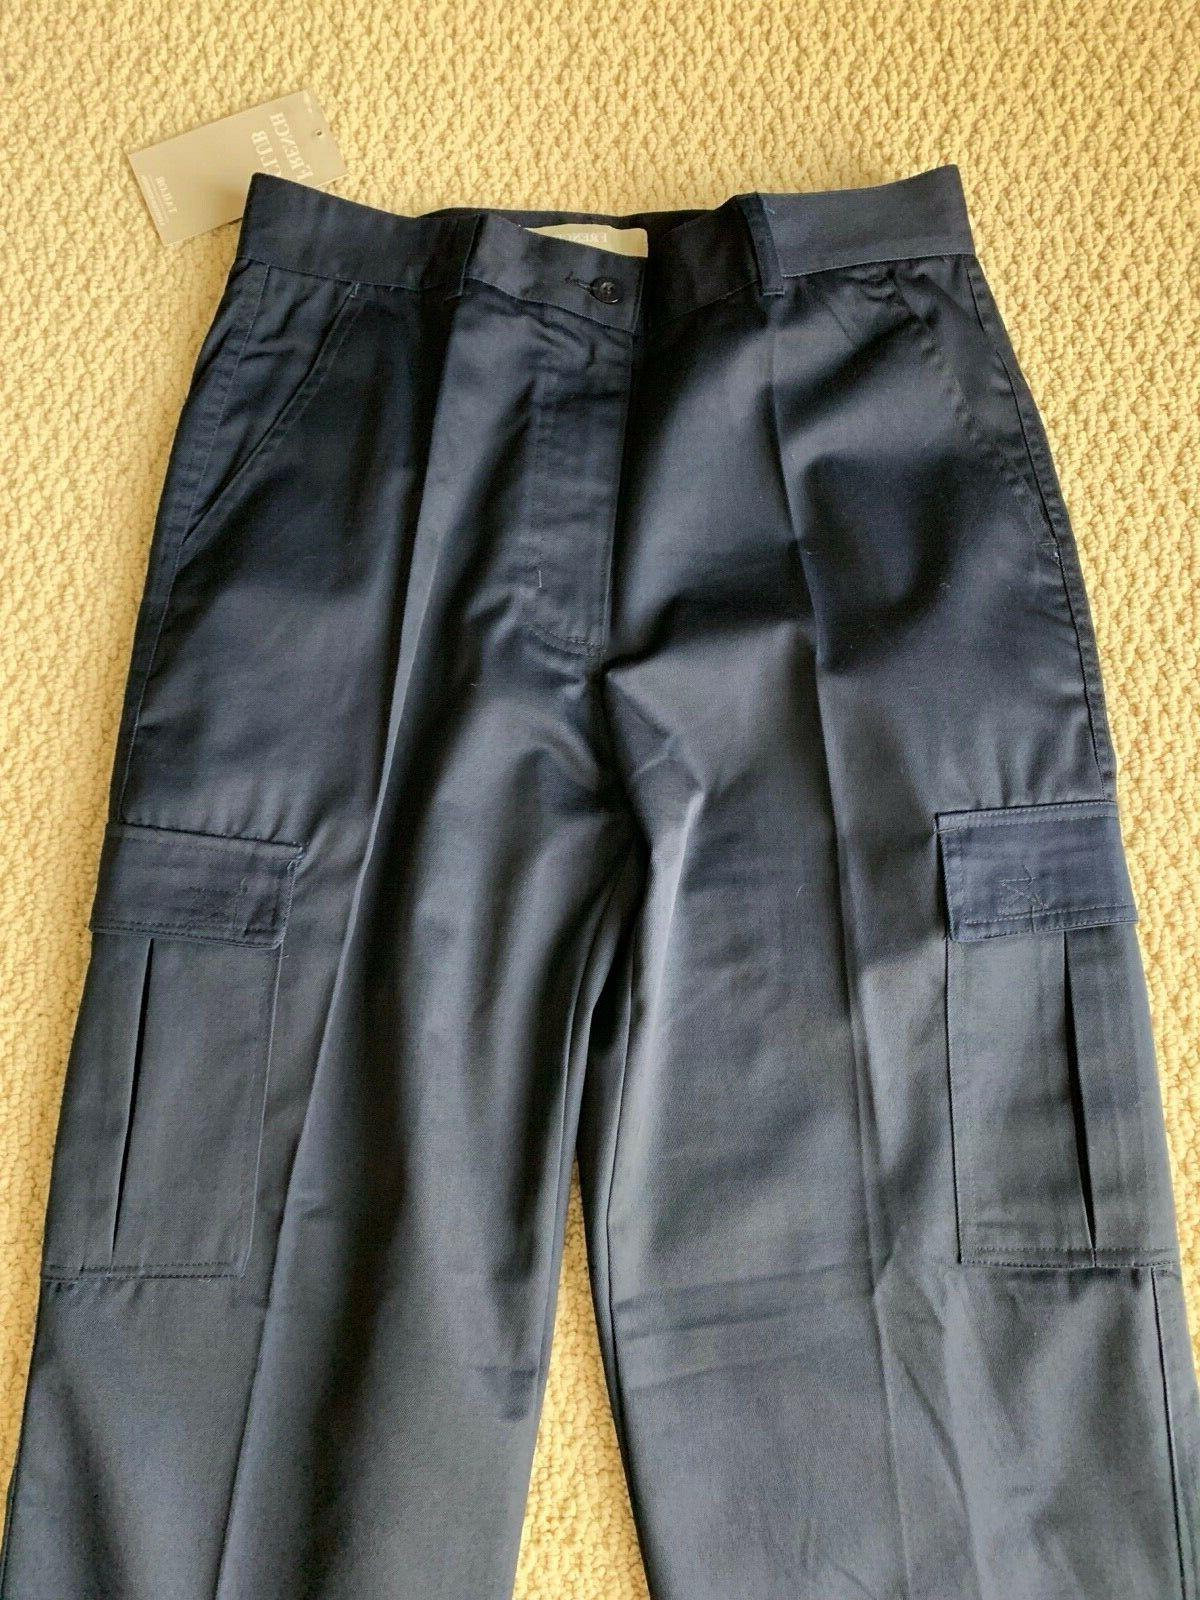 NWT Men's Classic Flap Pocket Pants SIZE 30-40